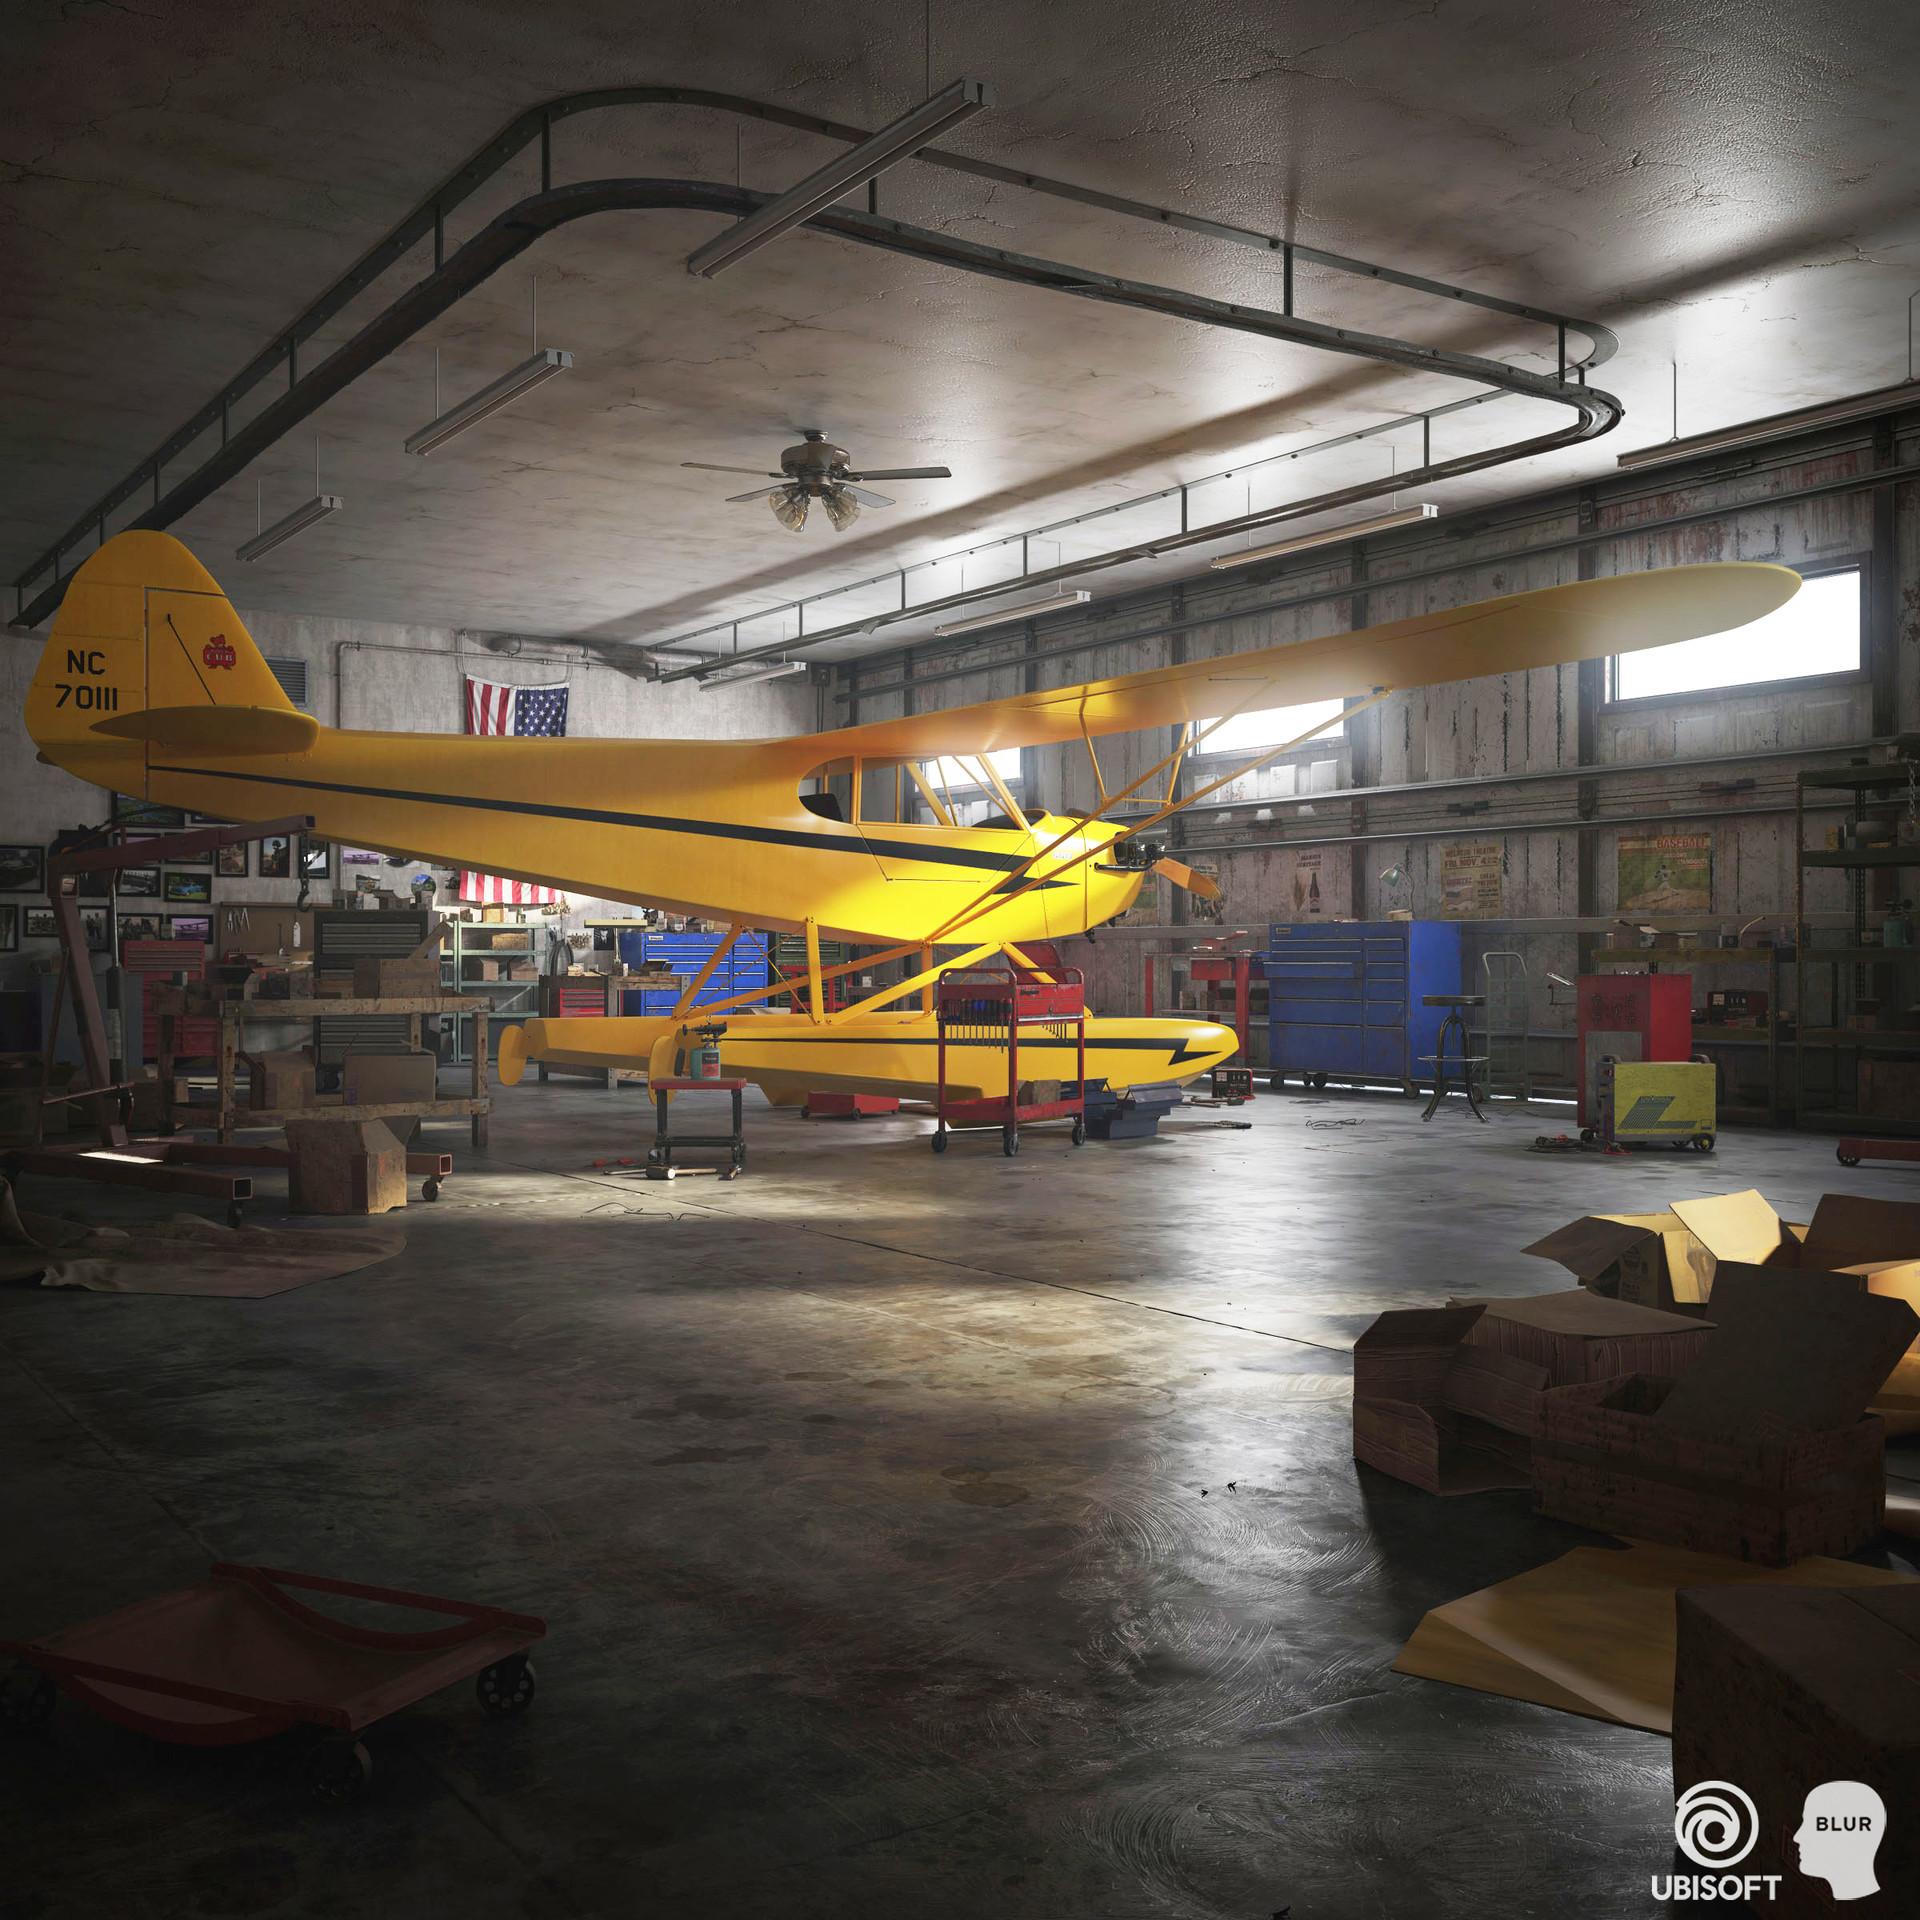 Andrew averkin zeta hangar 14